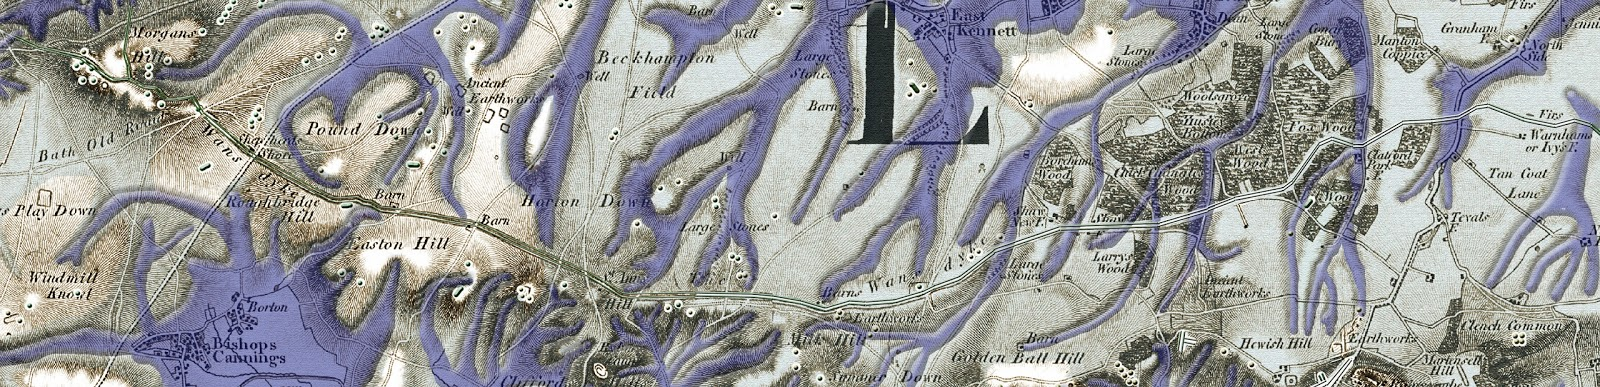 Prehistoric Wansdyke Map